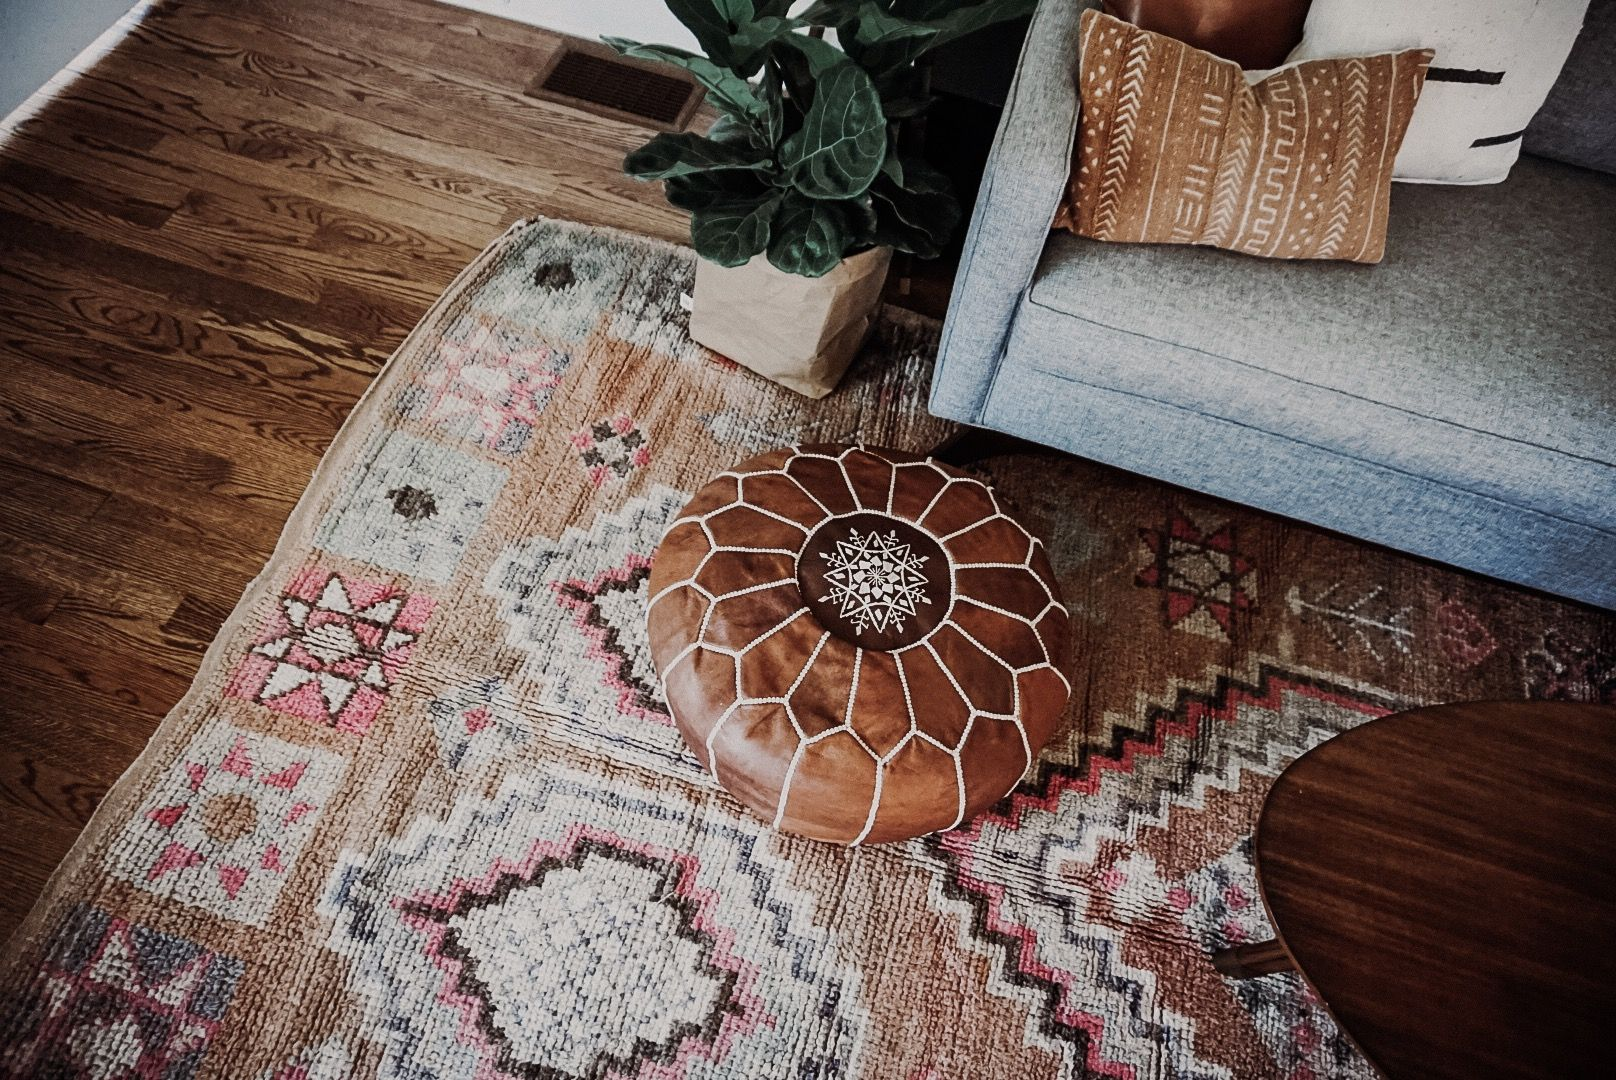 Vintage Wool Moroccan Wedding Blanket Area Rug Online Oriental Rugs Persian On Chairish Darling Cashmere Blog Bohemian Home Design Living